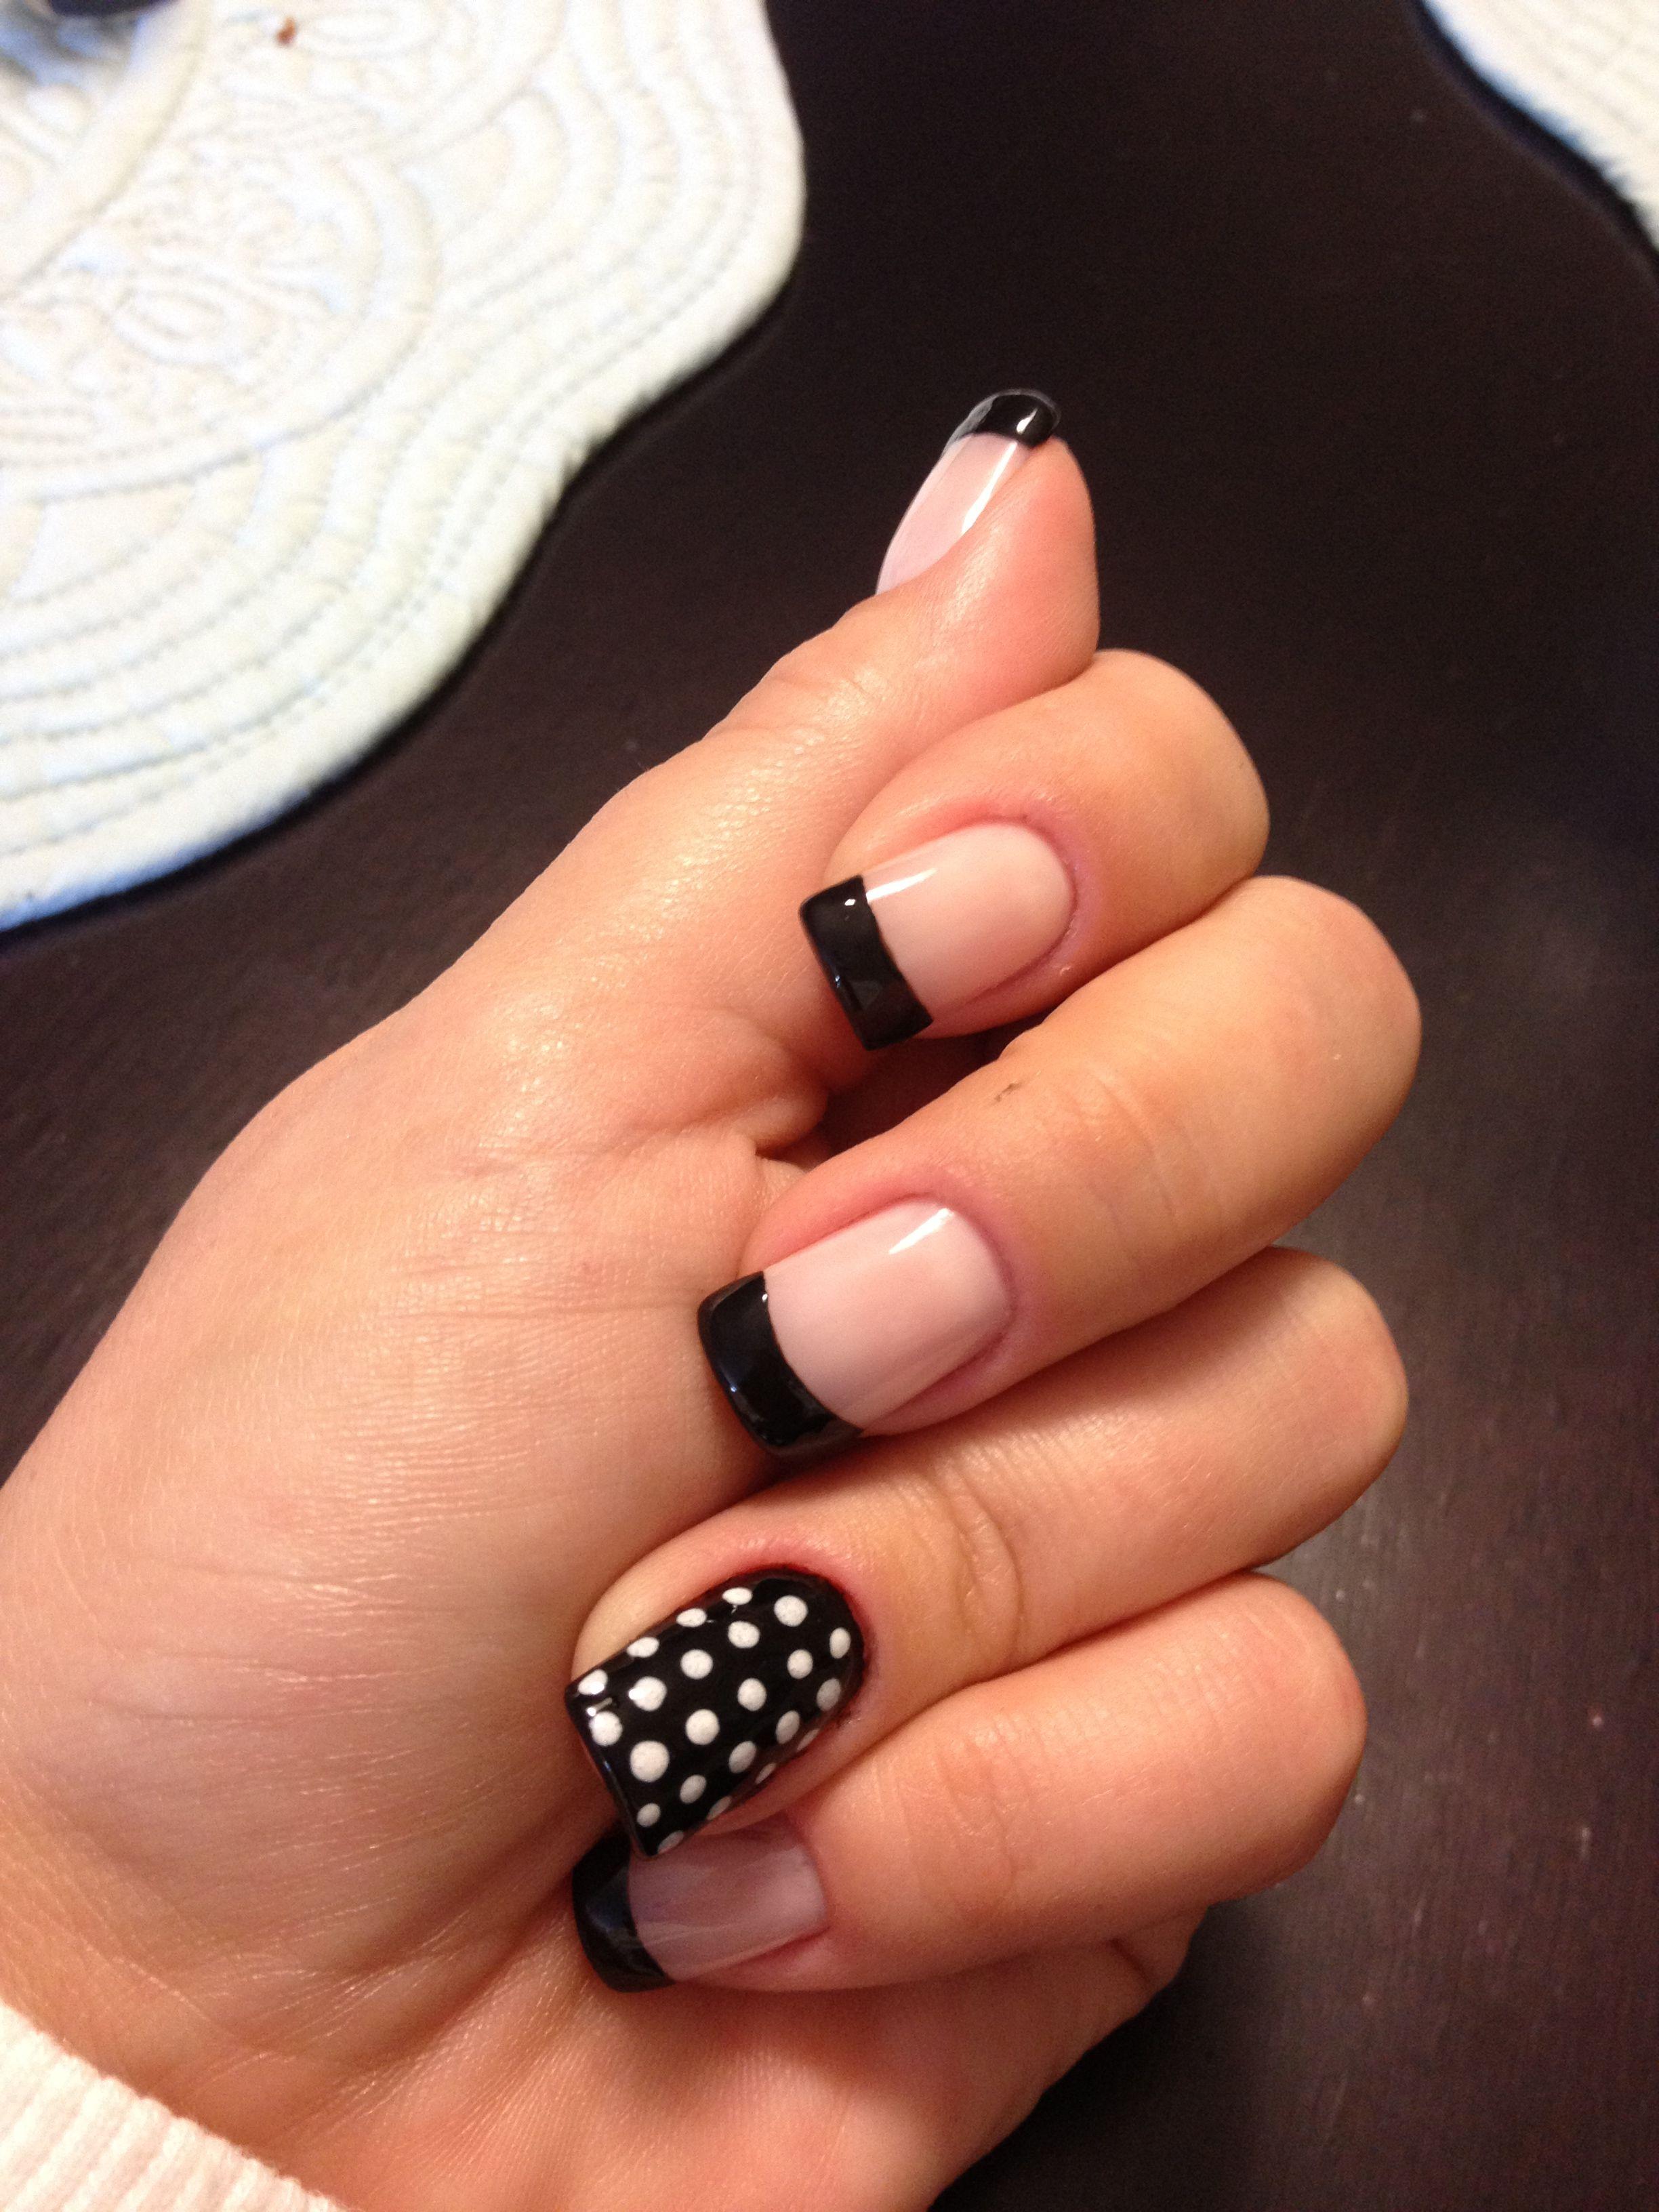 Black Tip FrenchManicure w/ Poka dot Accent Nail! | Nail ideas ...